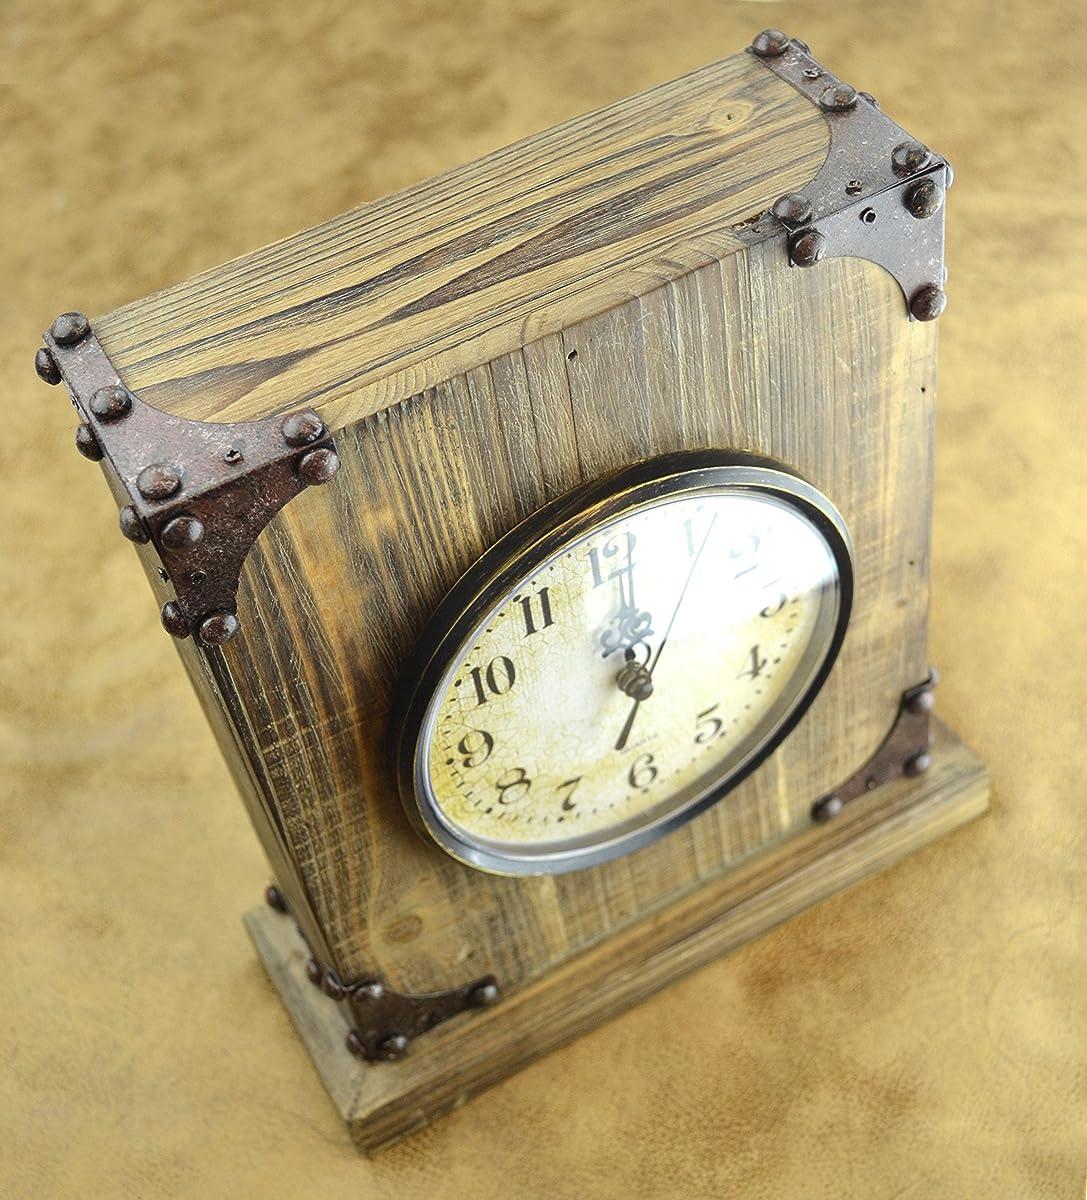 LuLu Decor, Rustic Wood Tabletop Clock with Key Holder in Hidden Area (Desk Clock)